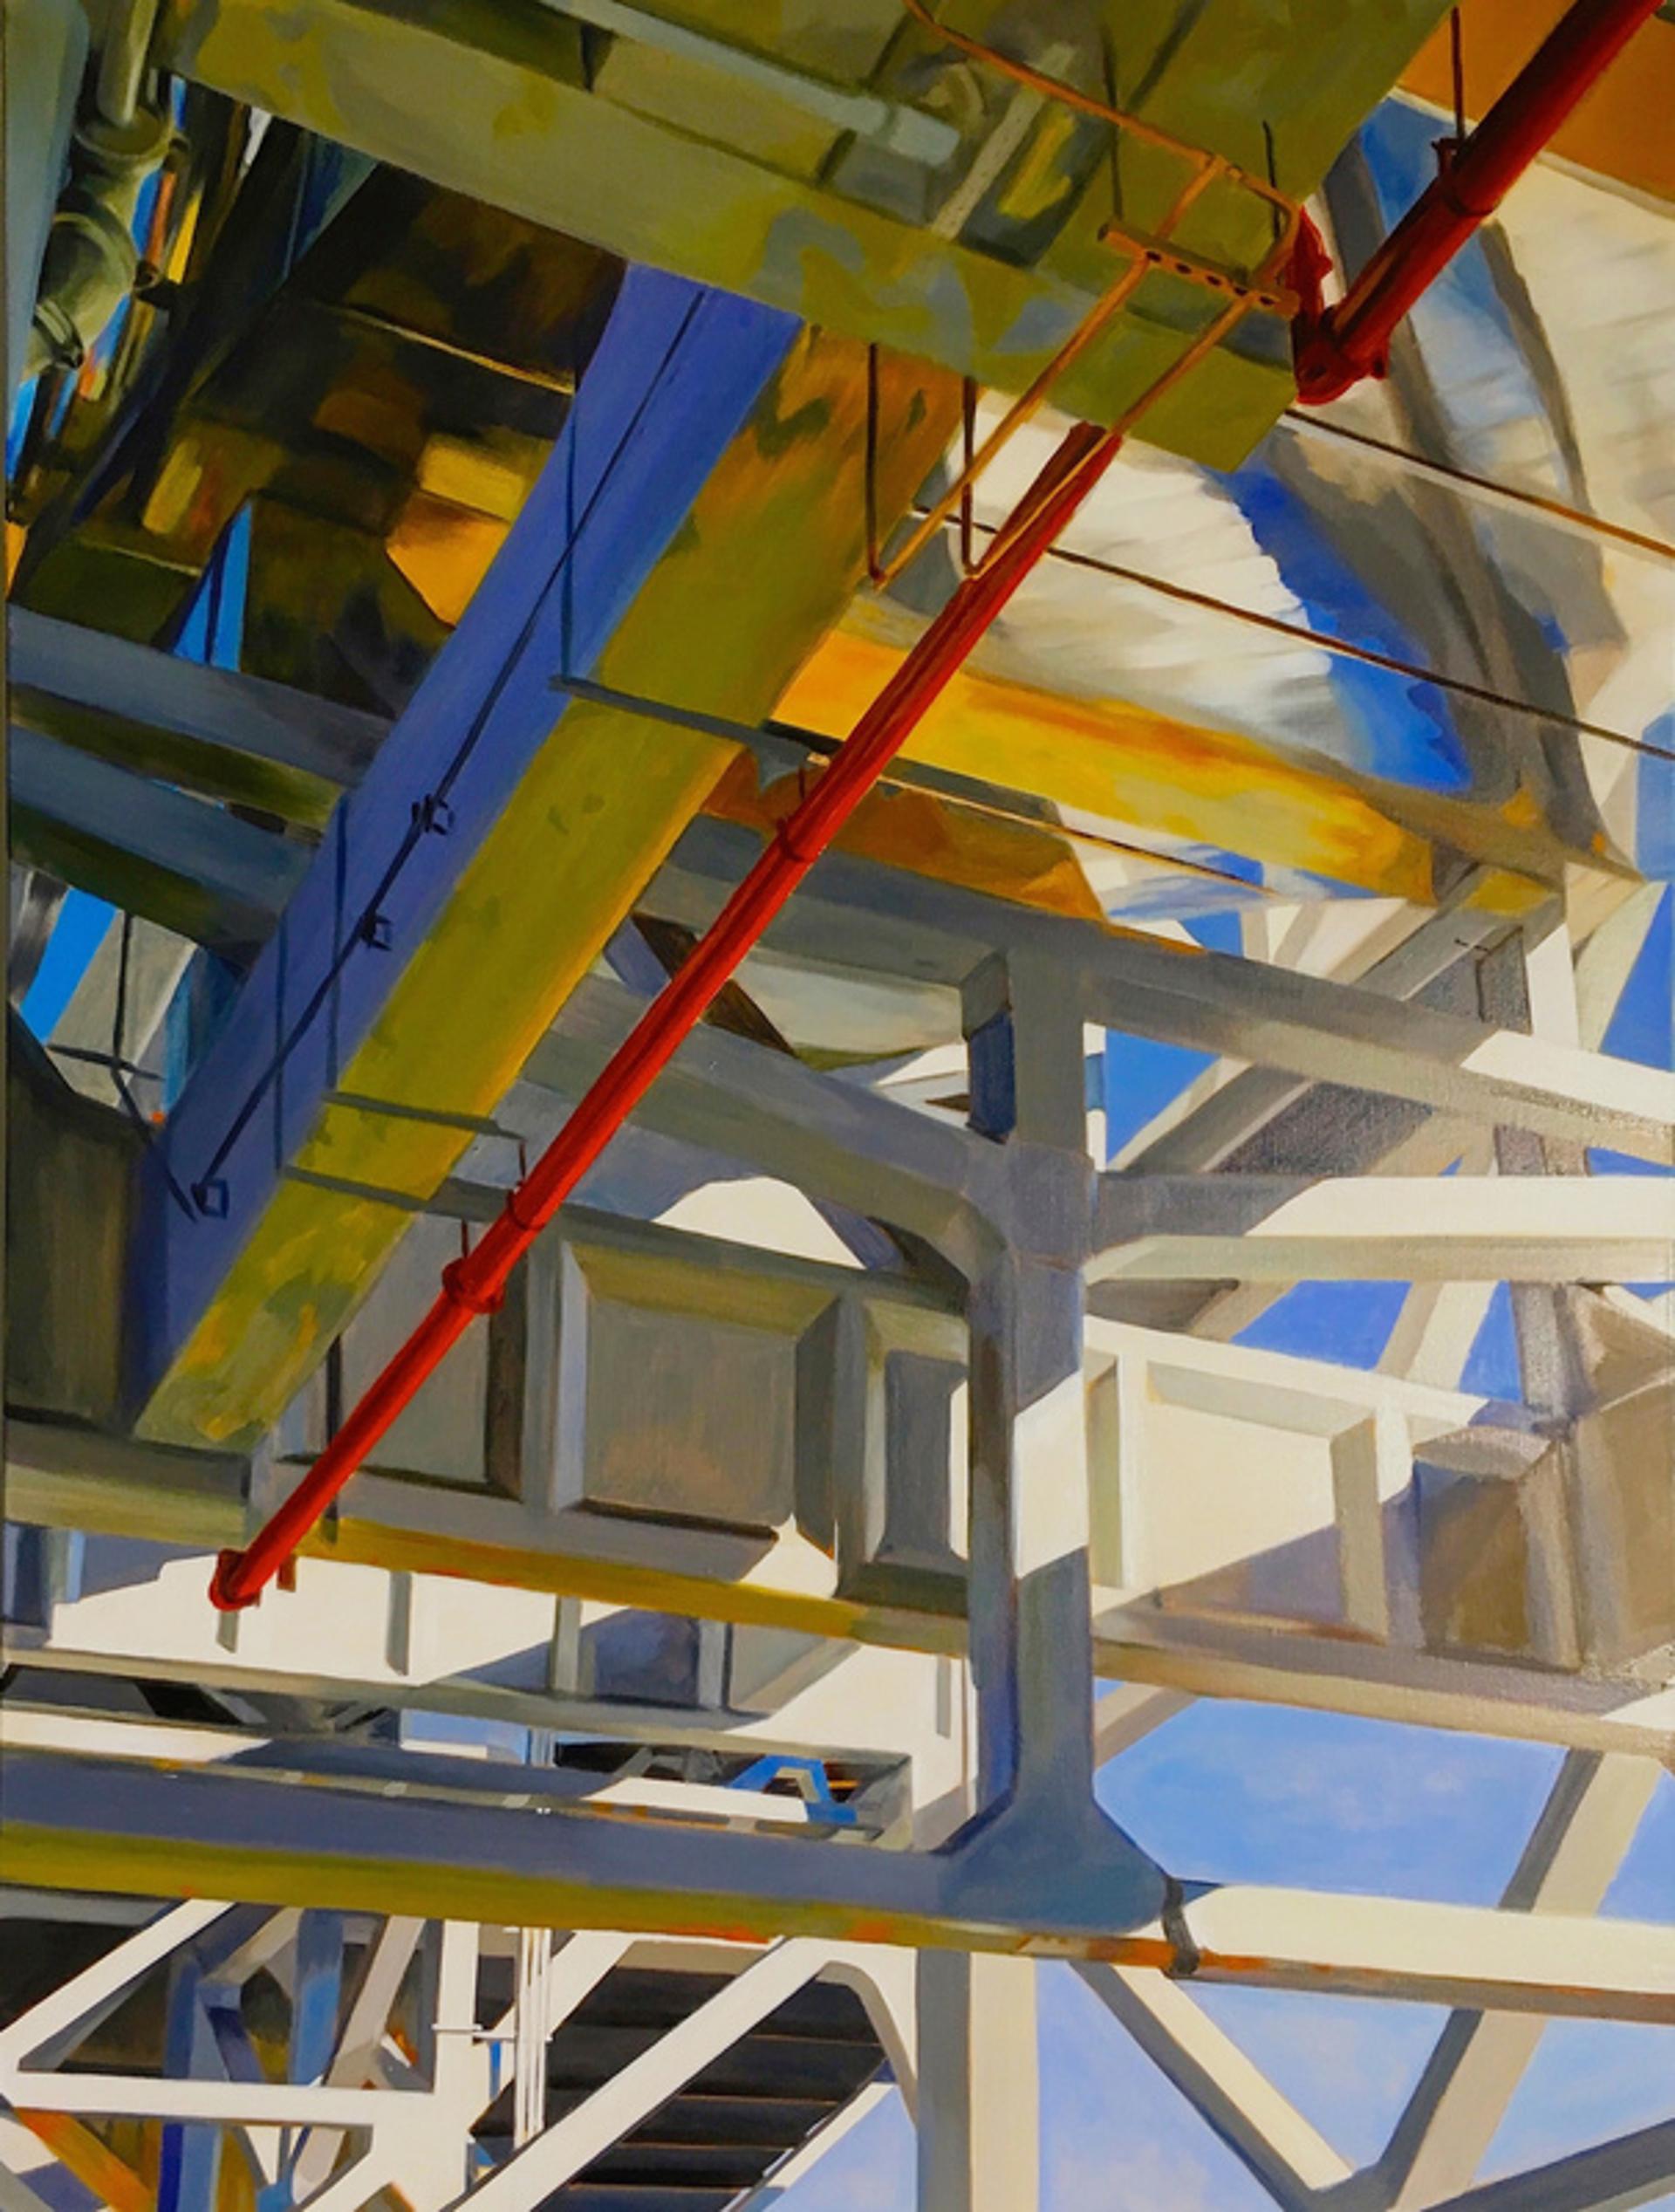 Red Pipe by Allan Gorman